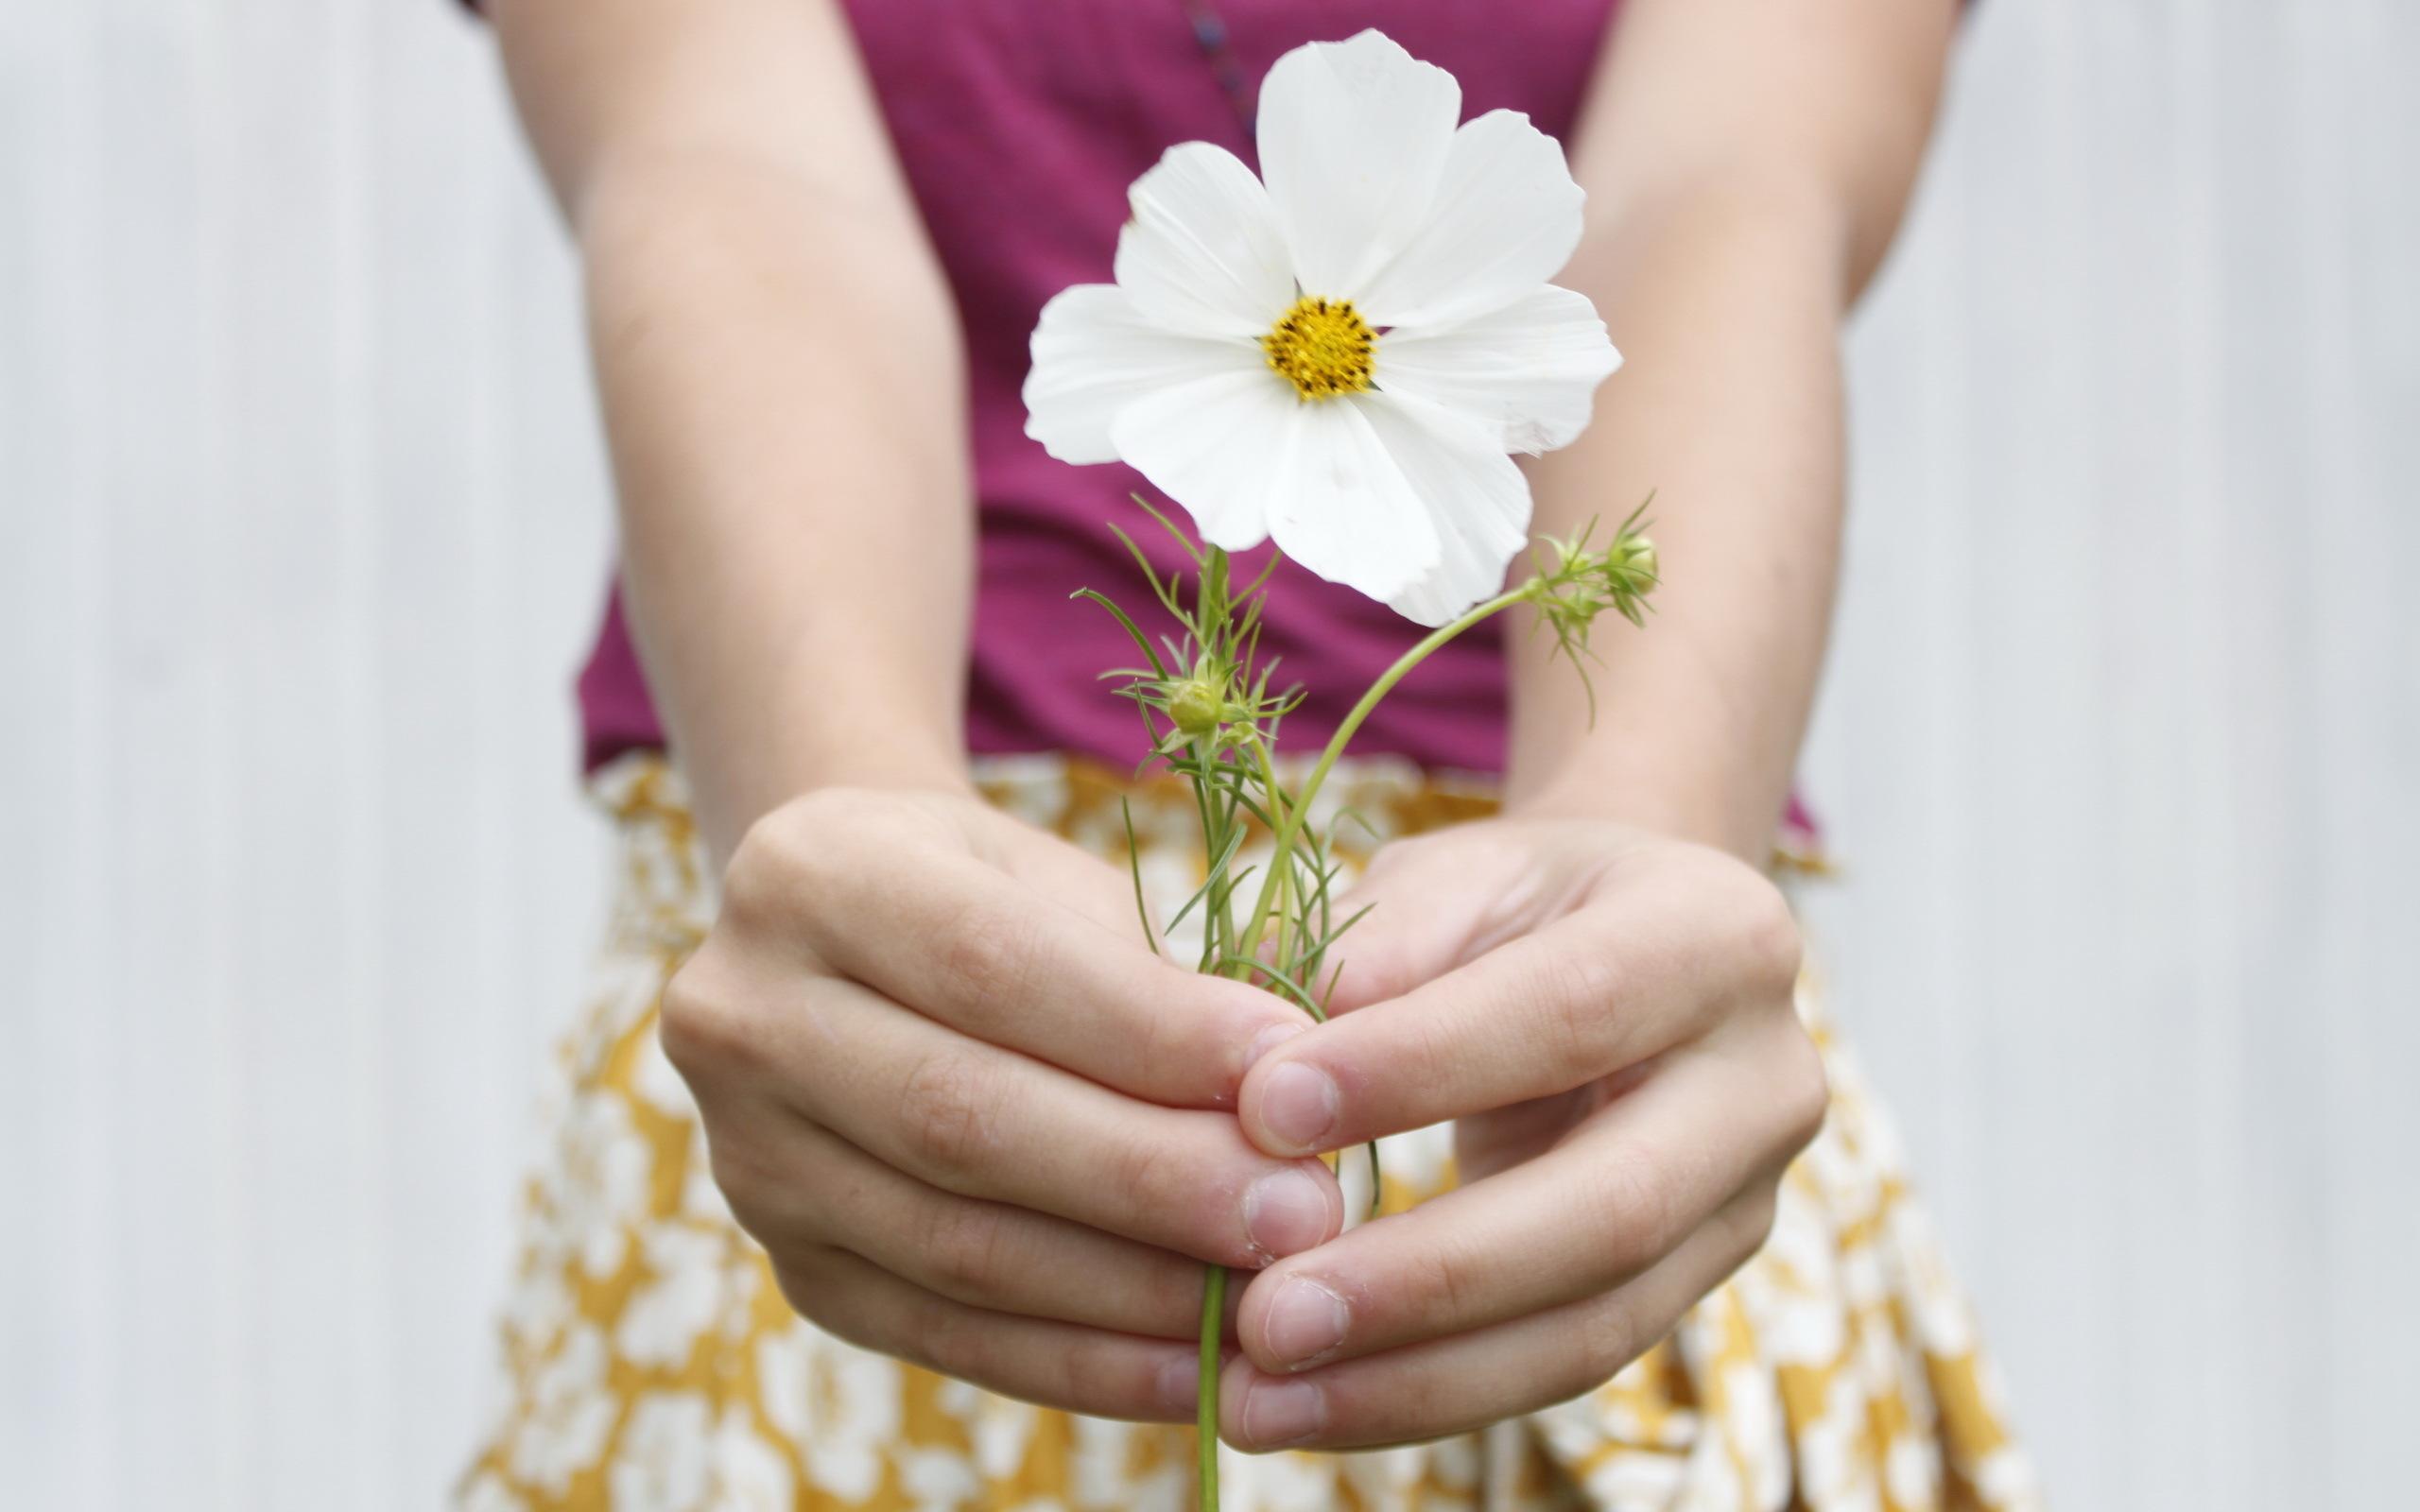 выполнен фоне фото женская рука с цветами дарударе дарим